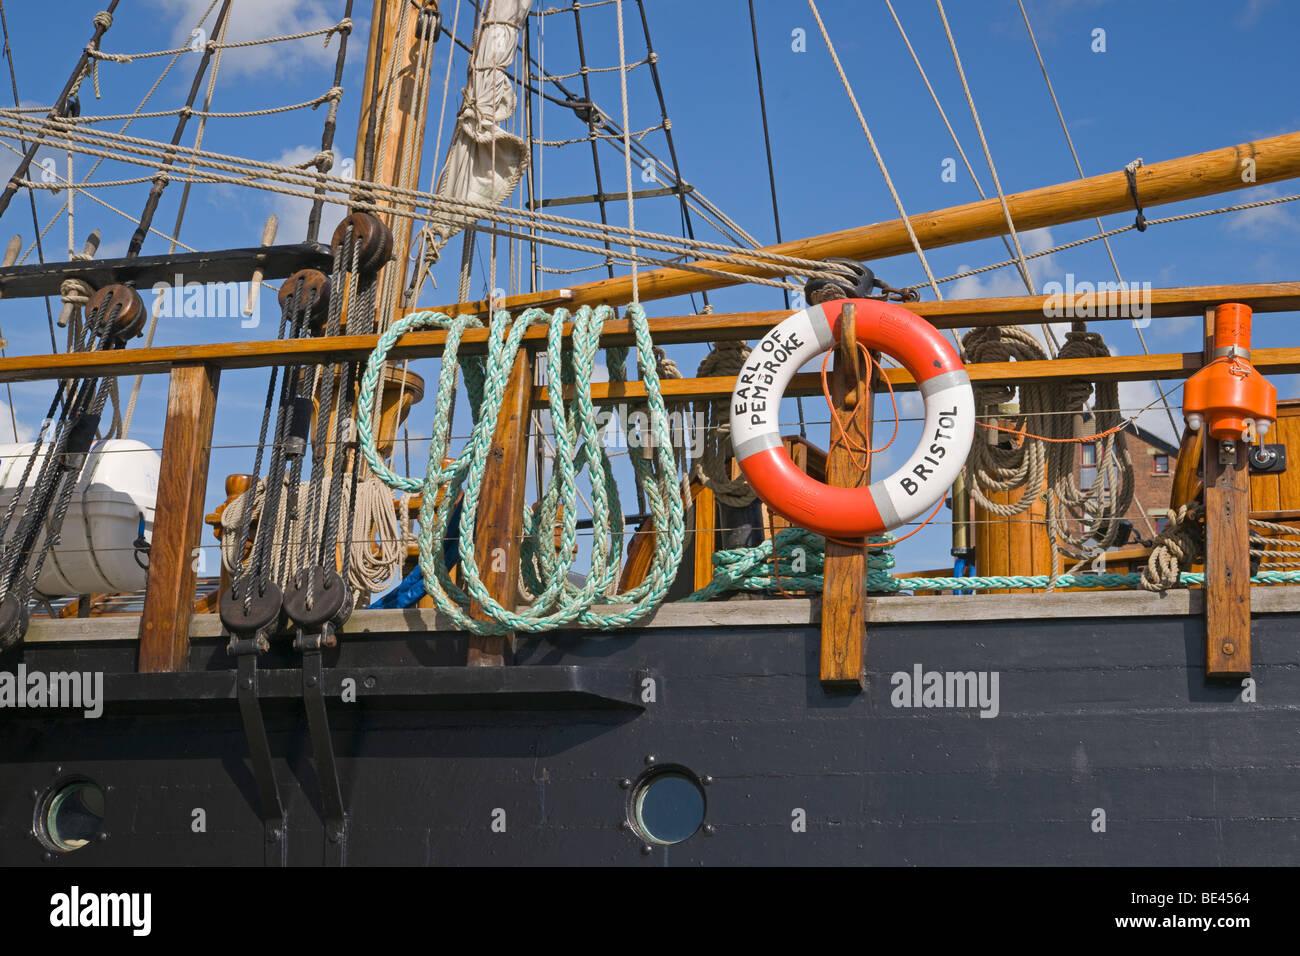 Gloucester docks, historic sailing ship, urban renewal, Gloucestershire, Cotswolds, England, July, 2009 - Stock Image